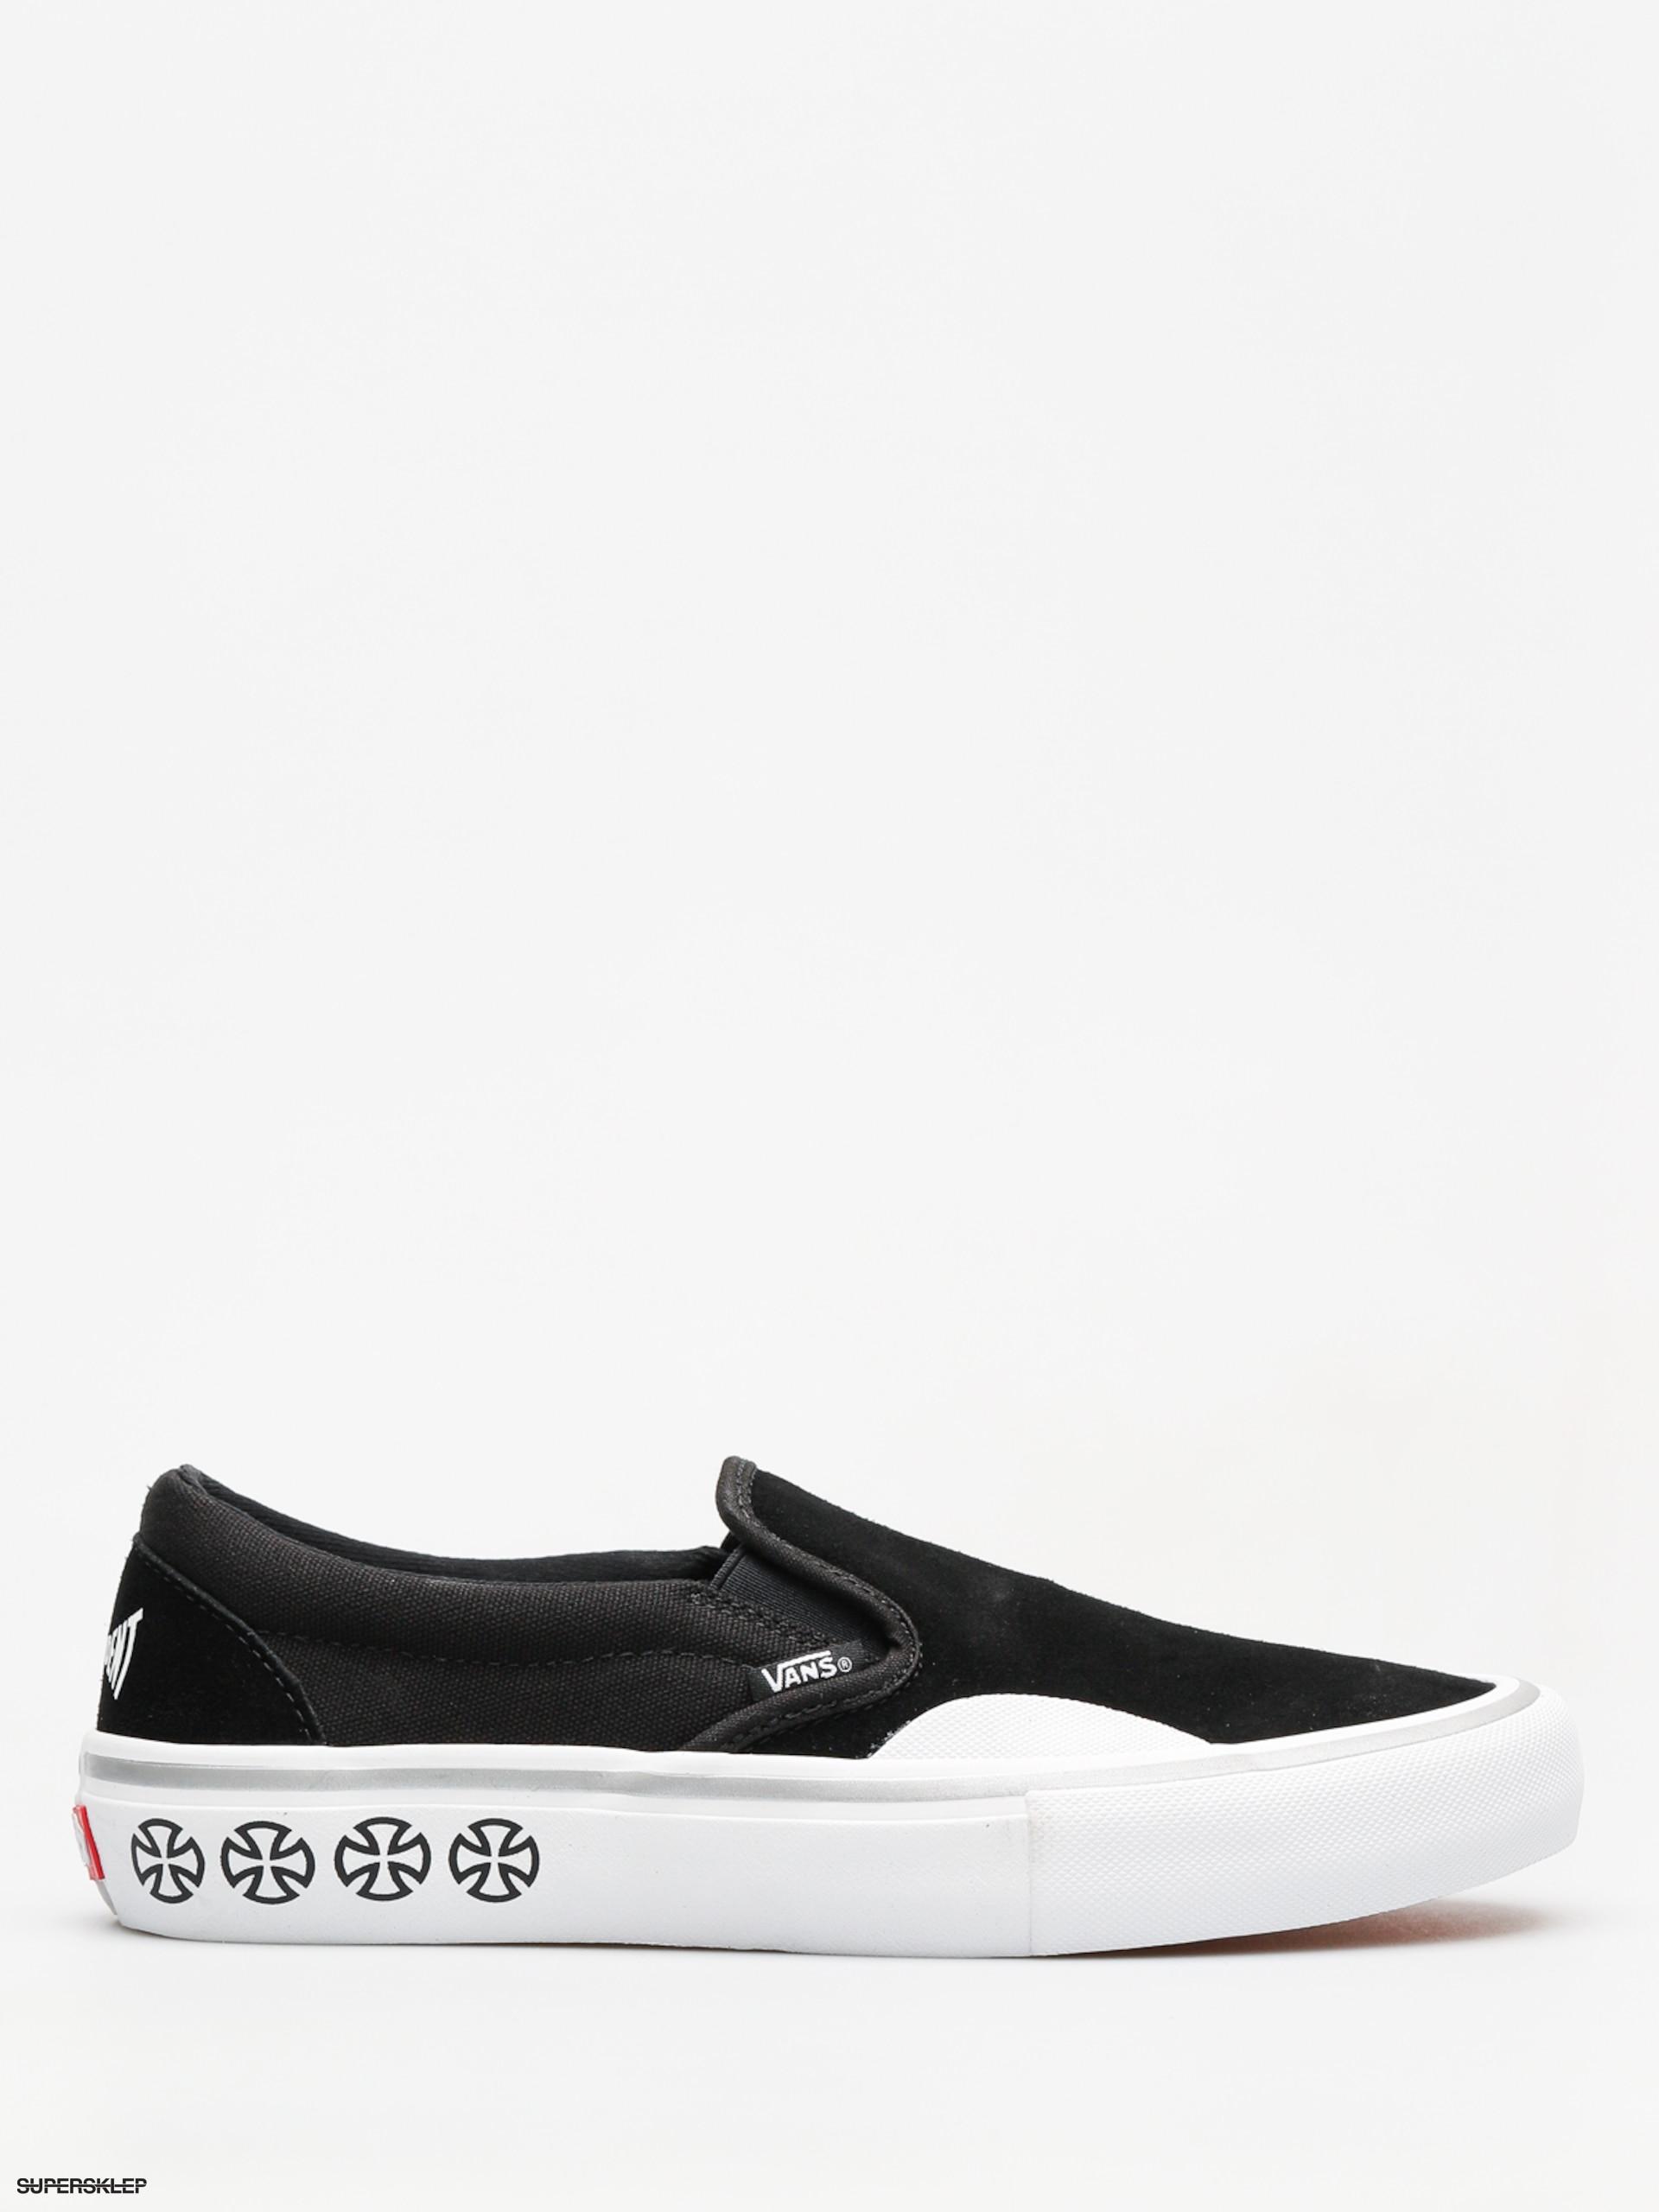 c9bcb2bec6 Topánky Vans x Independent Slip On Pro (independent black white)